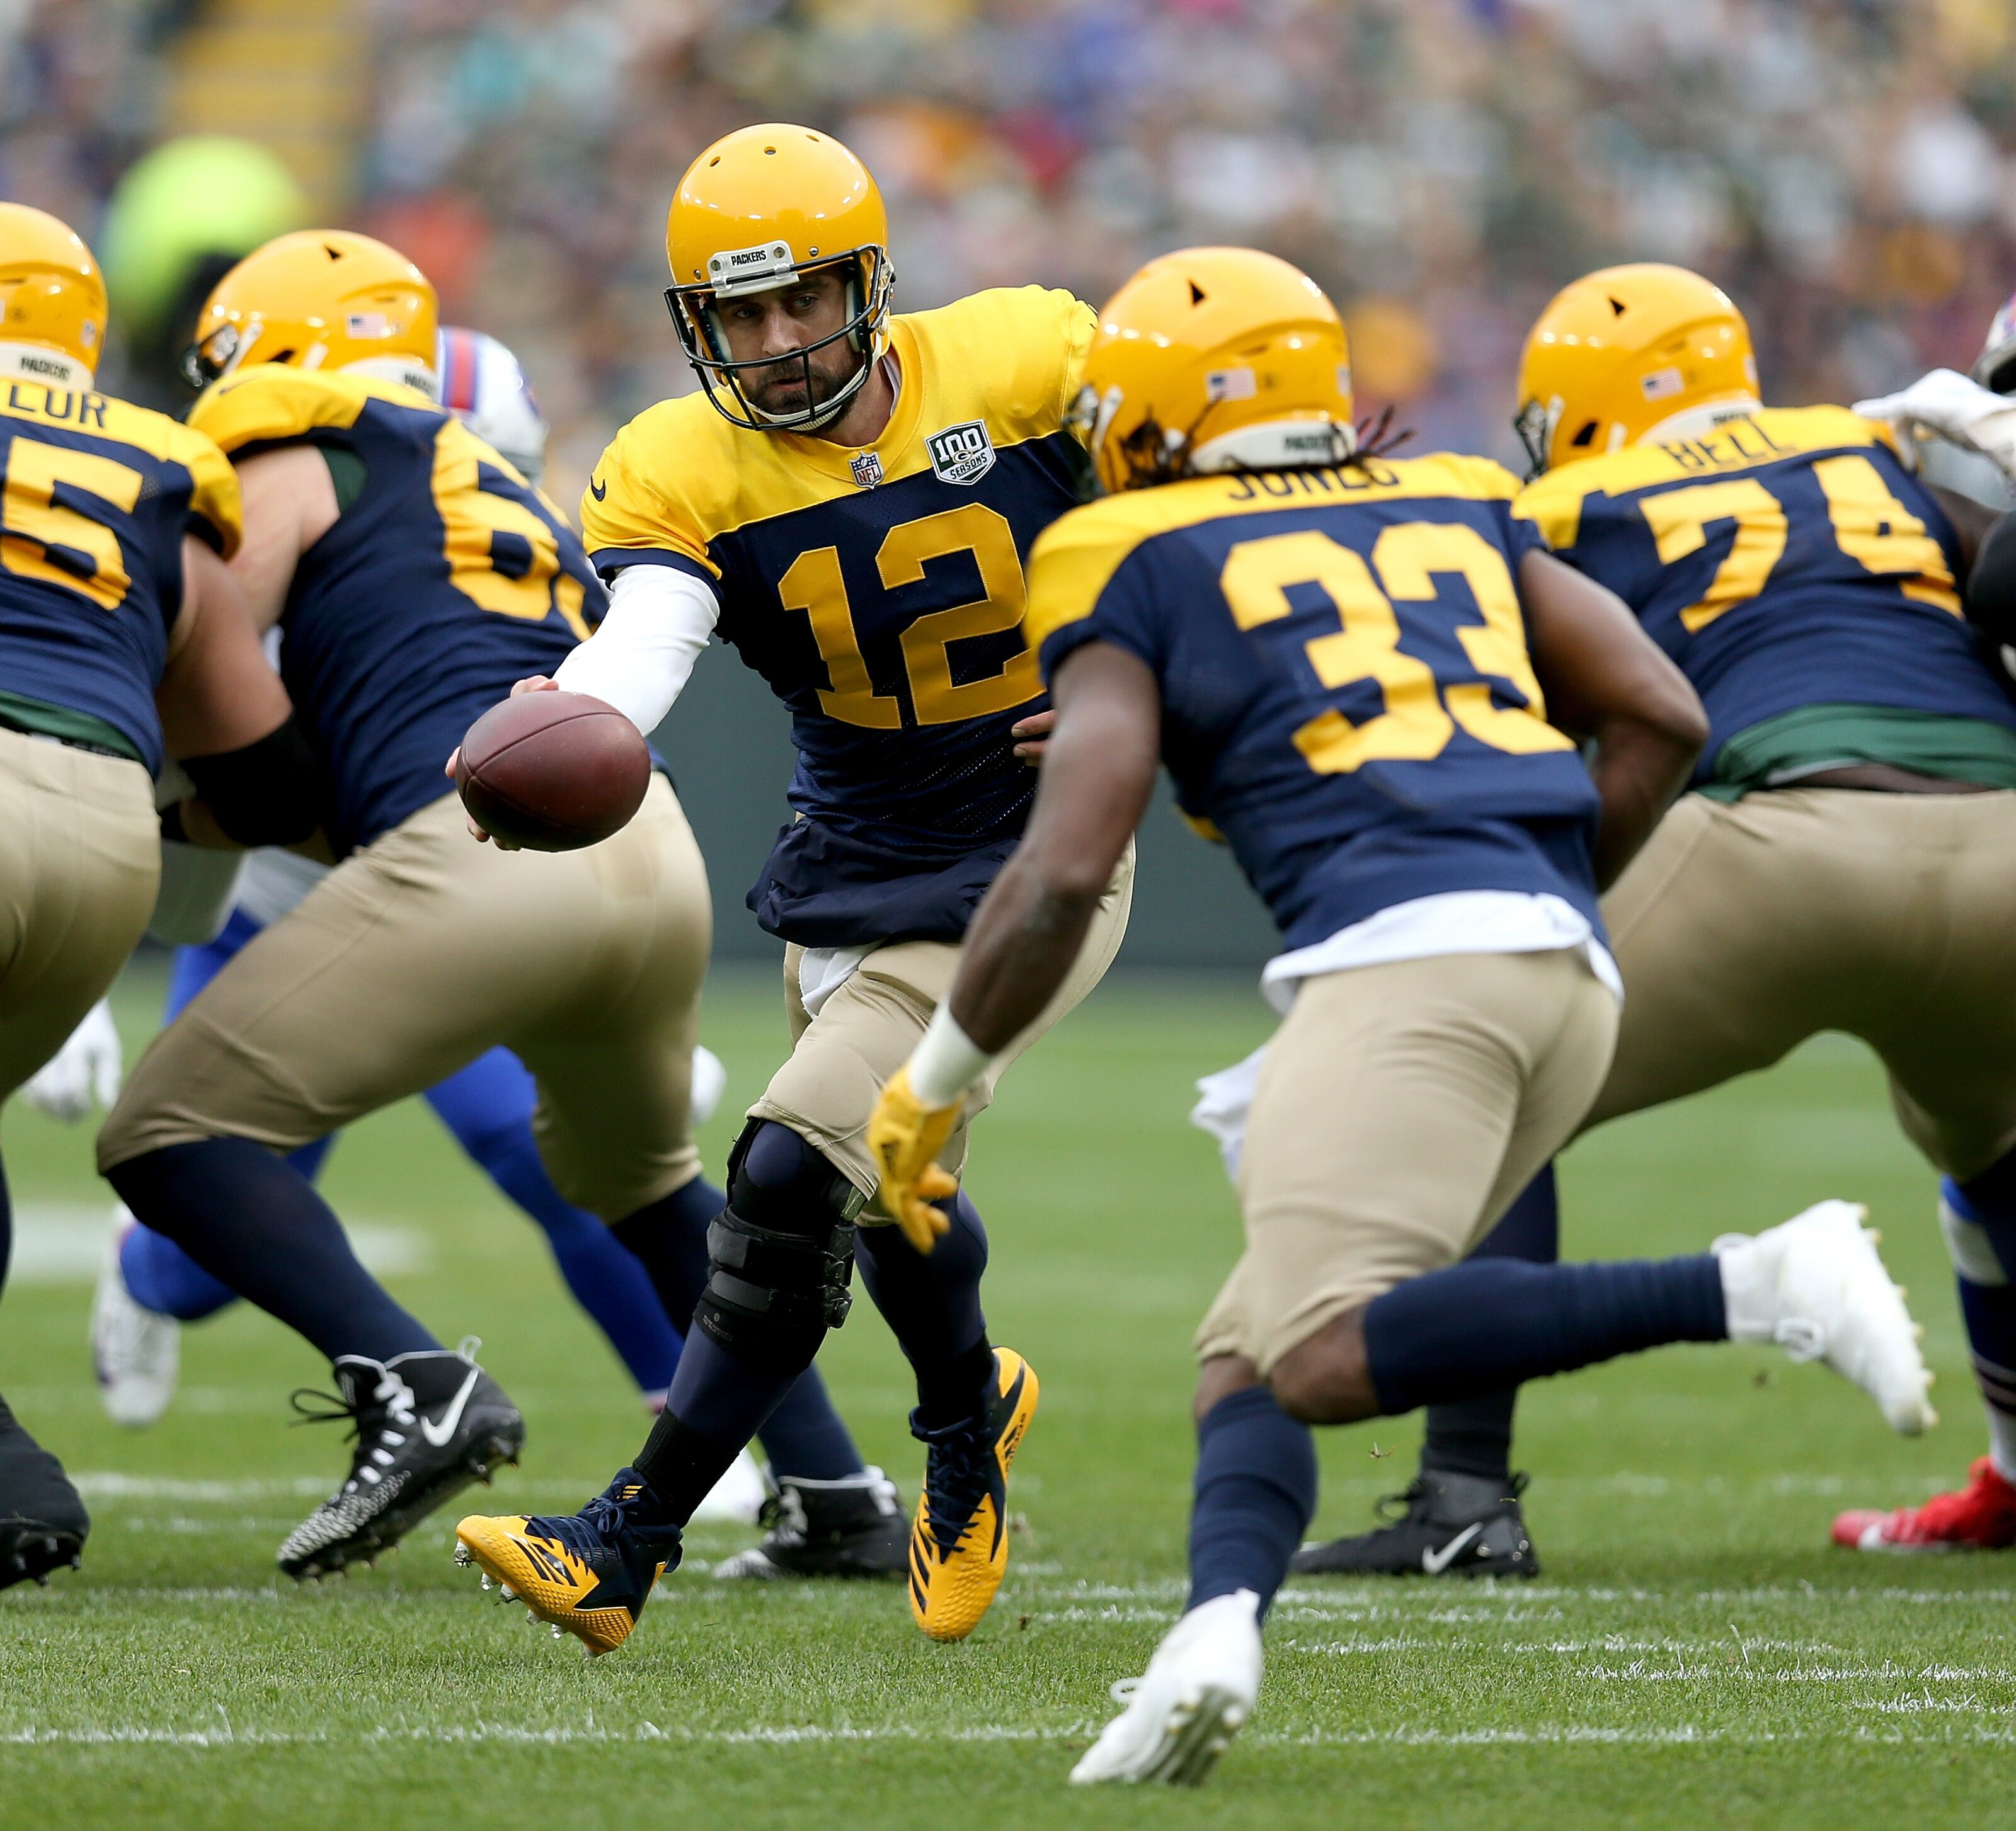 Week 11 Giants Vs Packers: Green Bay Packers: 3 Big Takeaways From Win Vs. Bills In